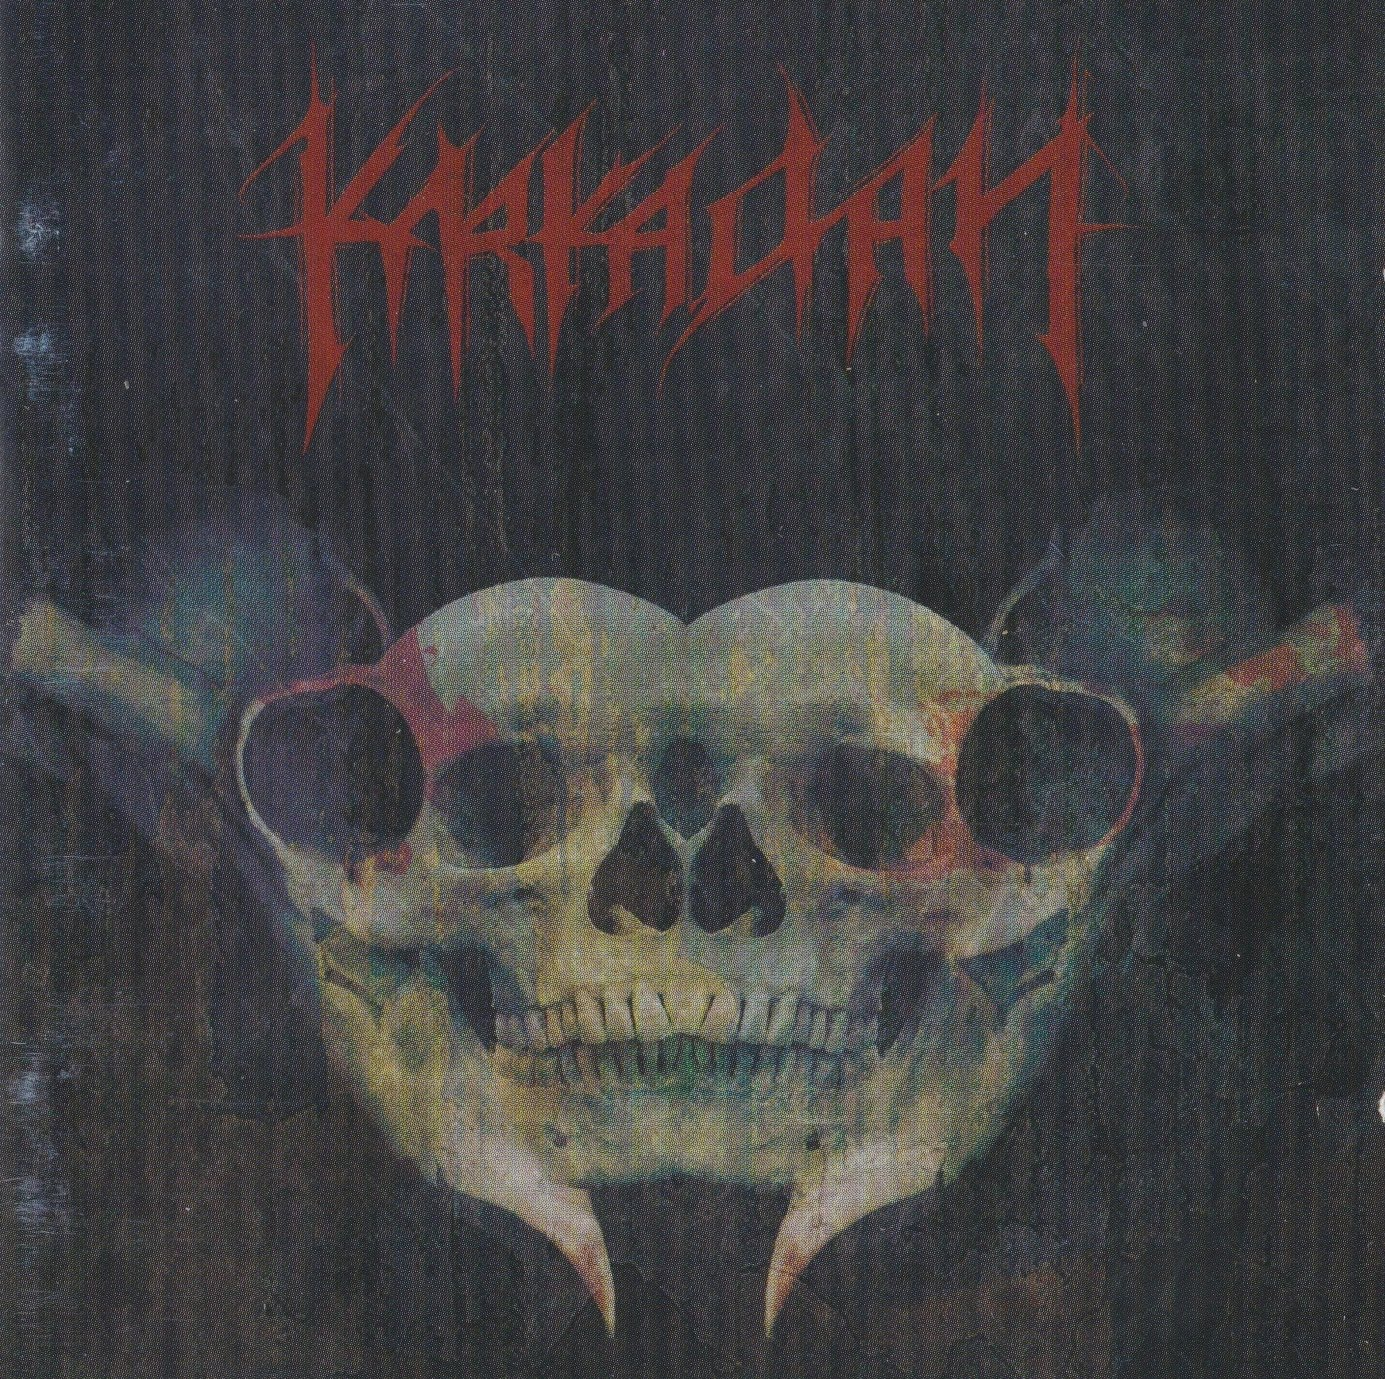 Karkadan — Eternal Black Reflections (1999)